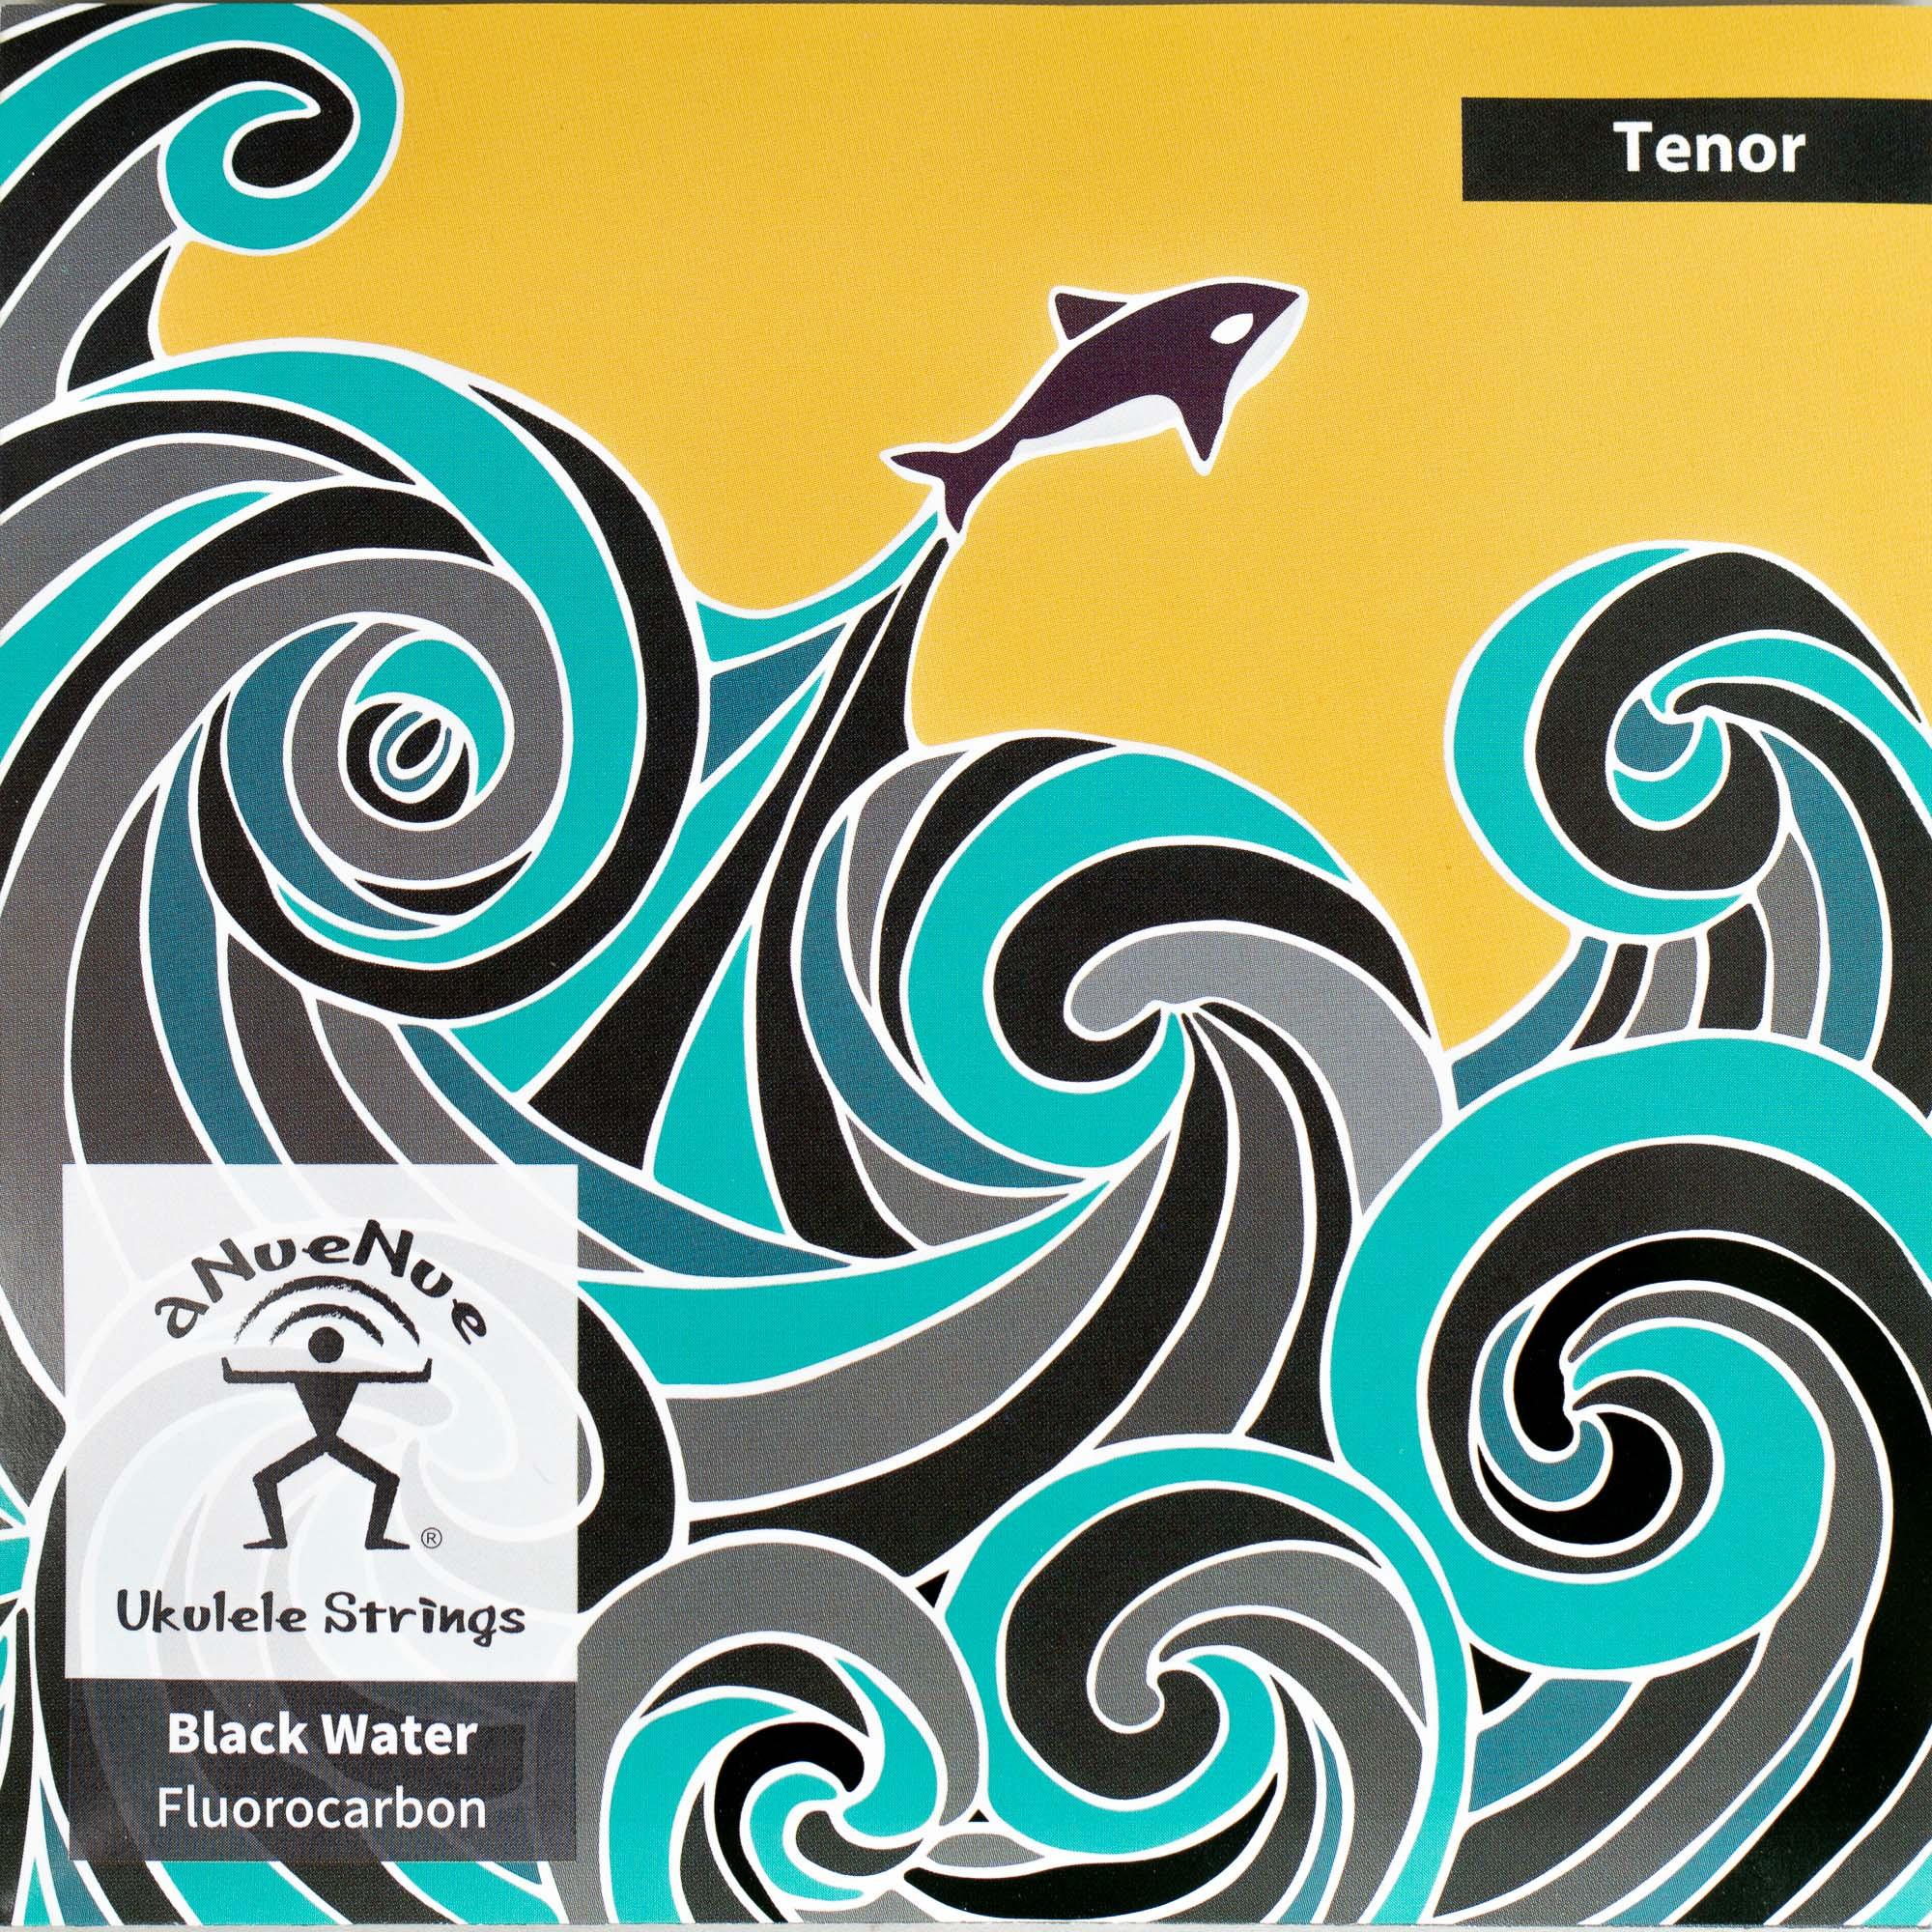 aNueNue Black Water Tenor String Set